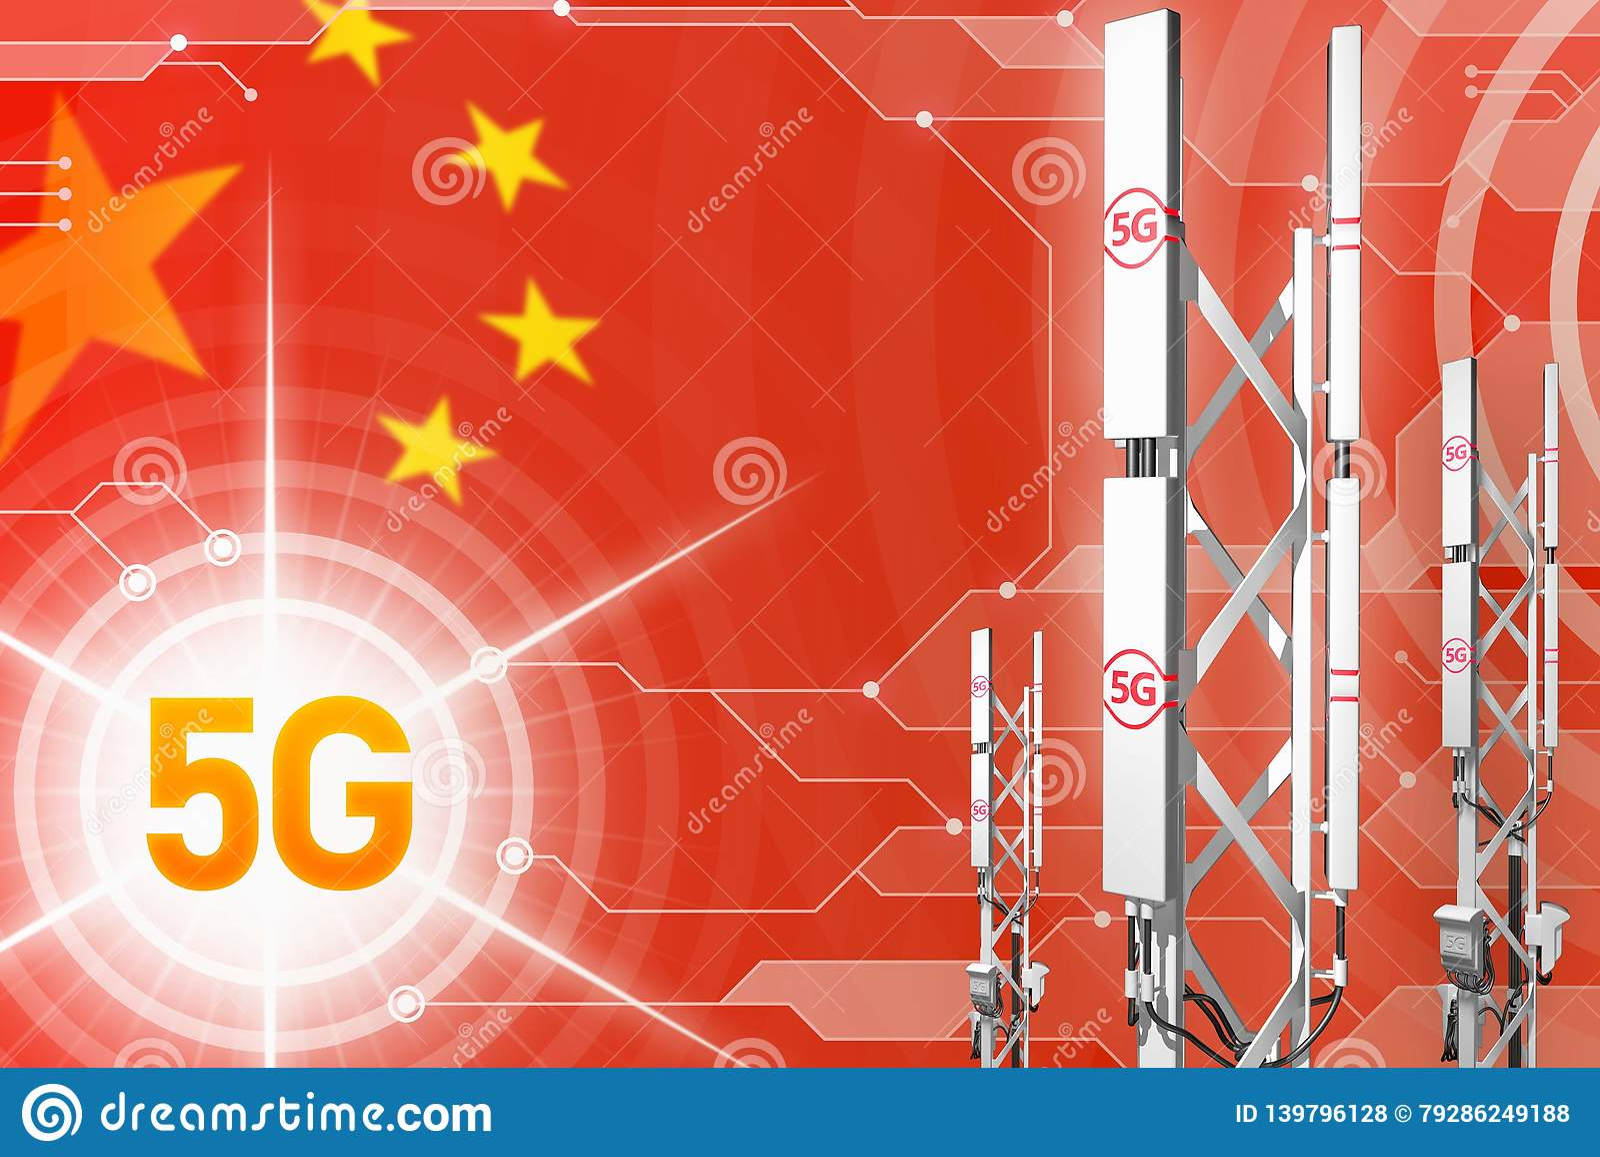 China 5G Industrial Illustration, Big Cellular Network Mast Or Tower